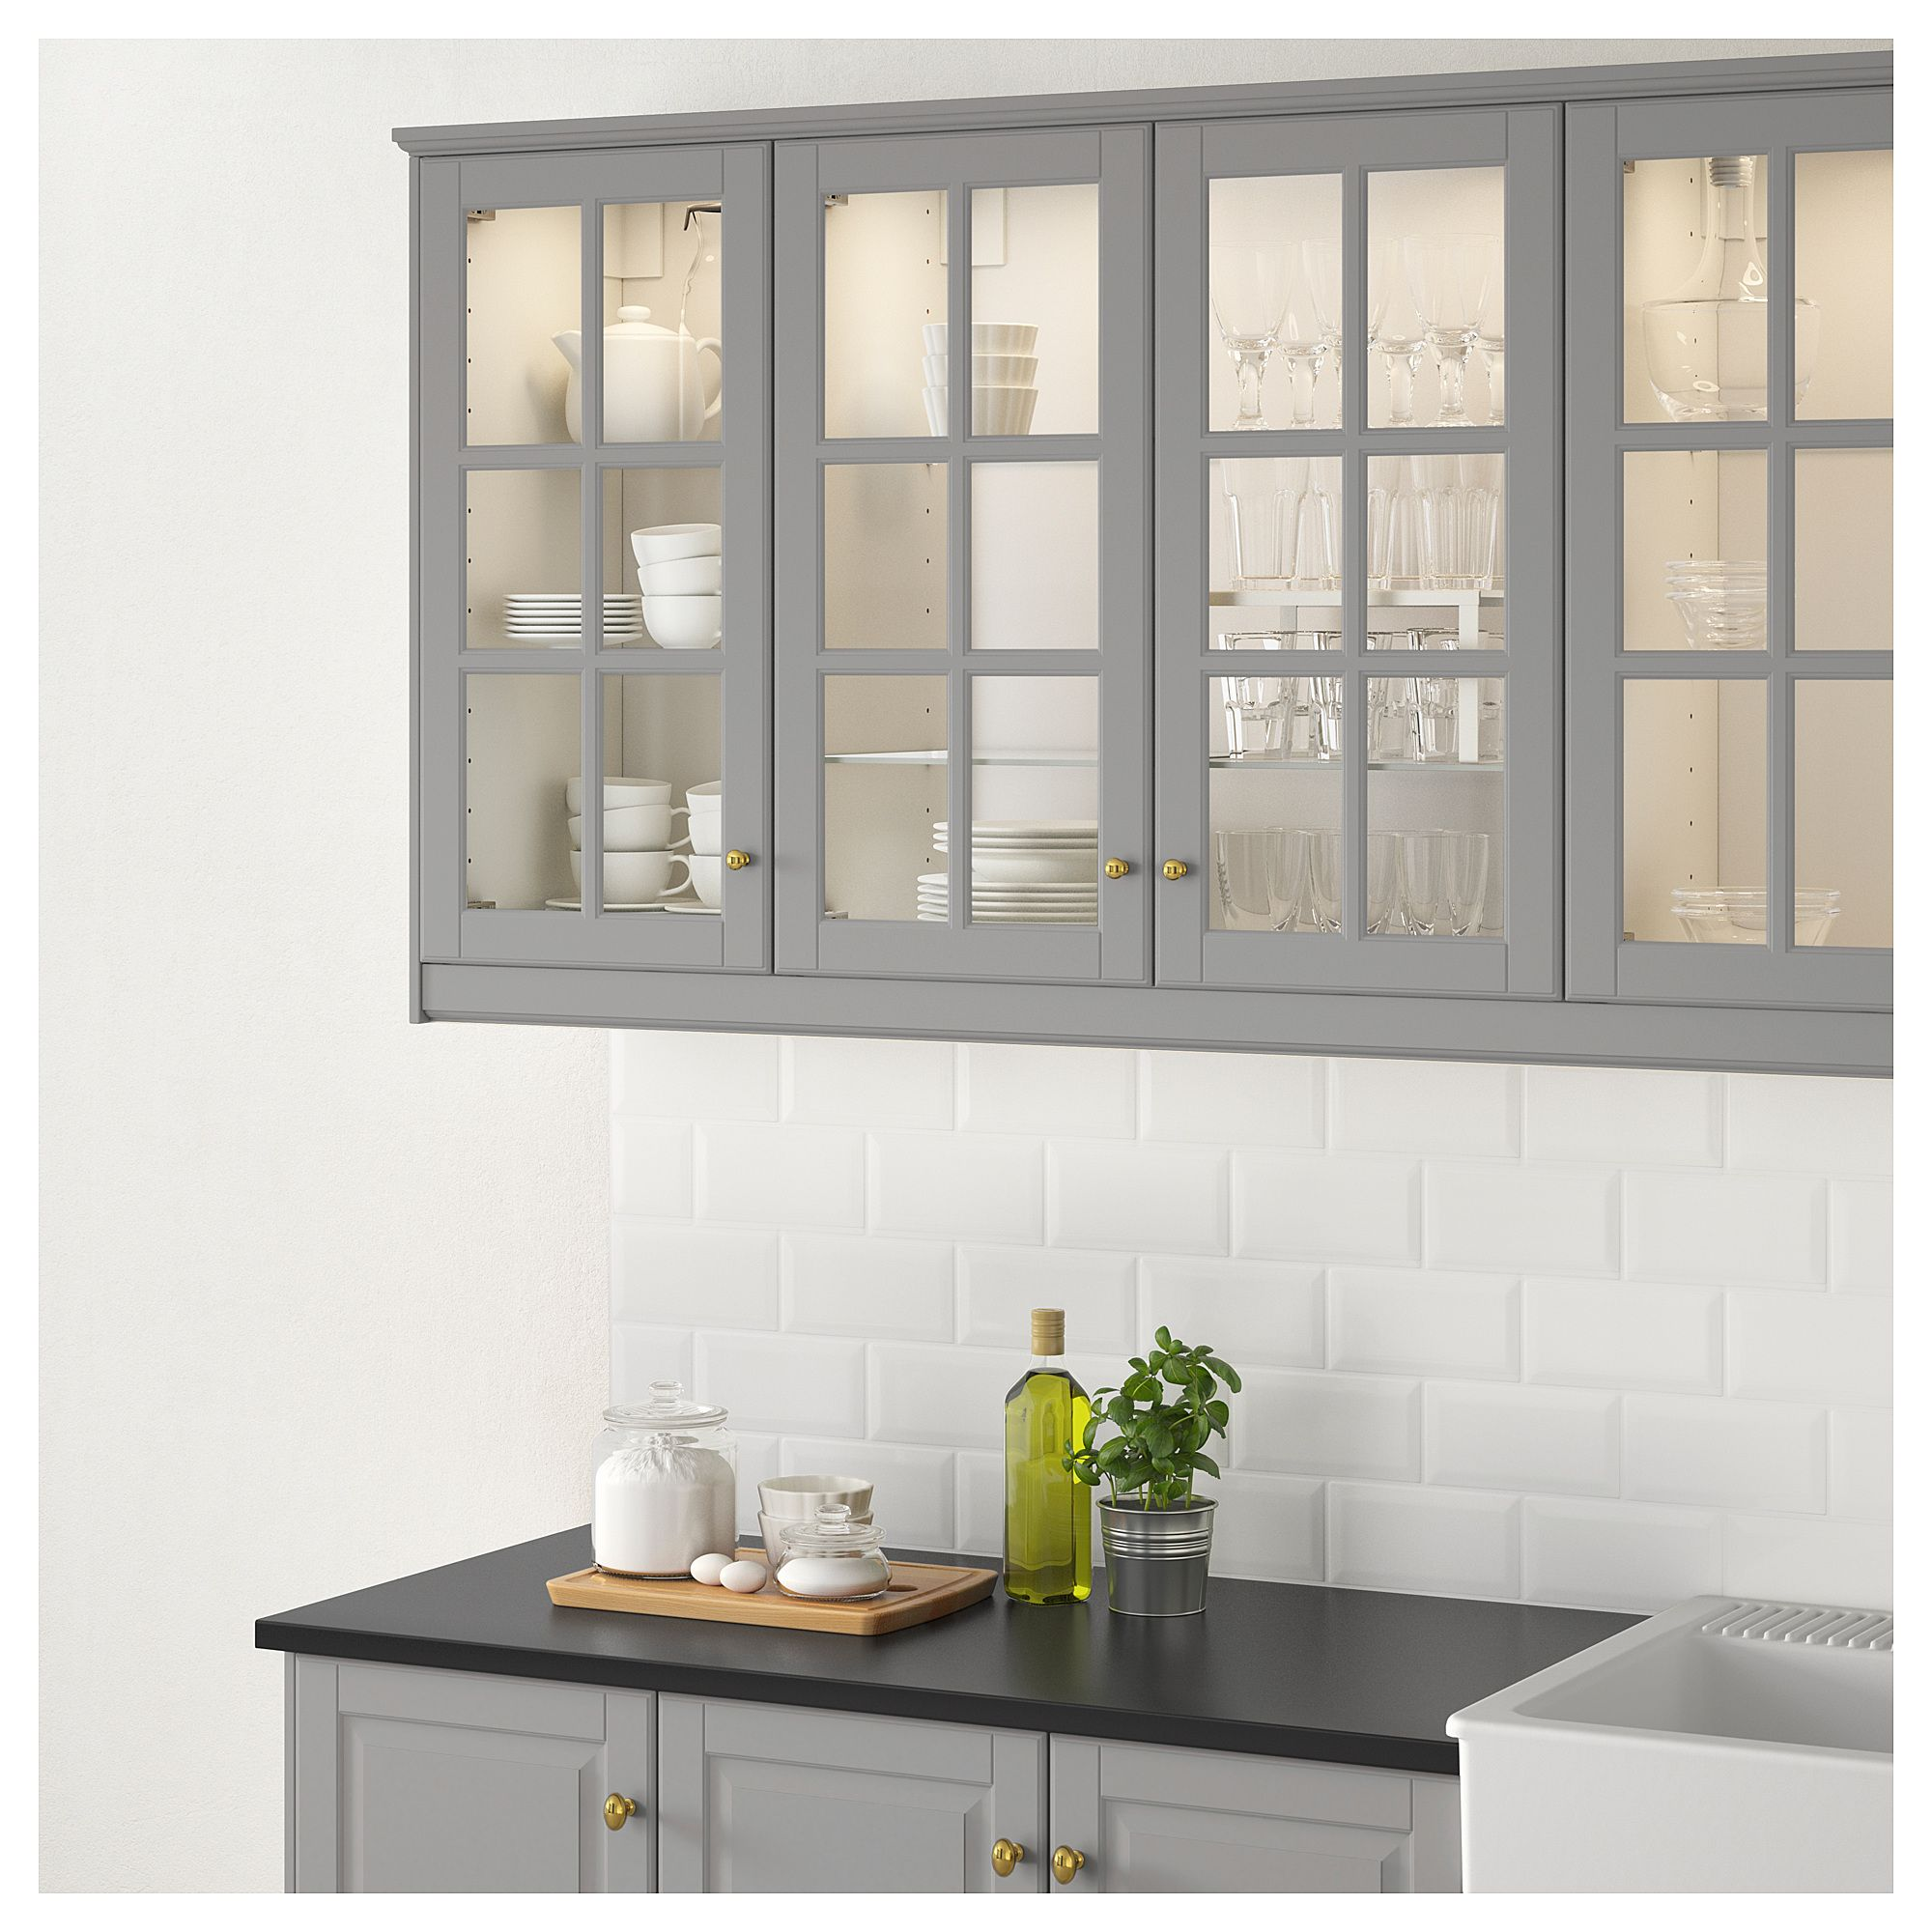 Best Ikea Bodbyn Glass Door Gray Kitchen Design New 640 x 480